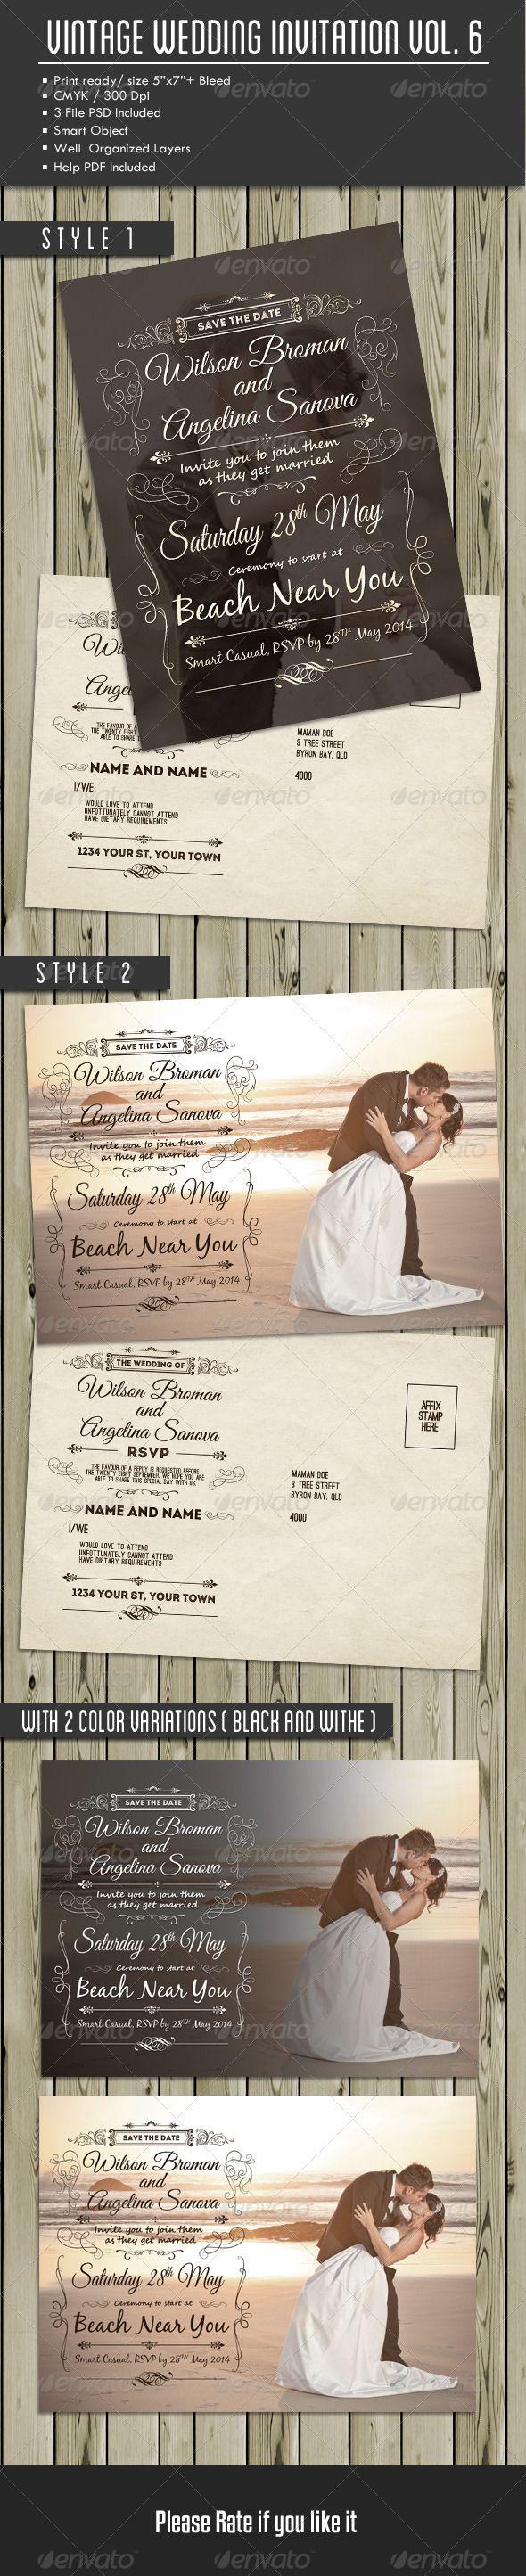 Vintage Wedding Invitation and RSVP Vol 6